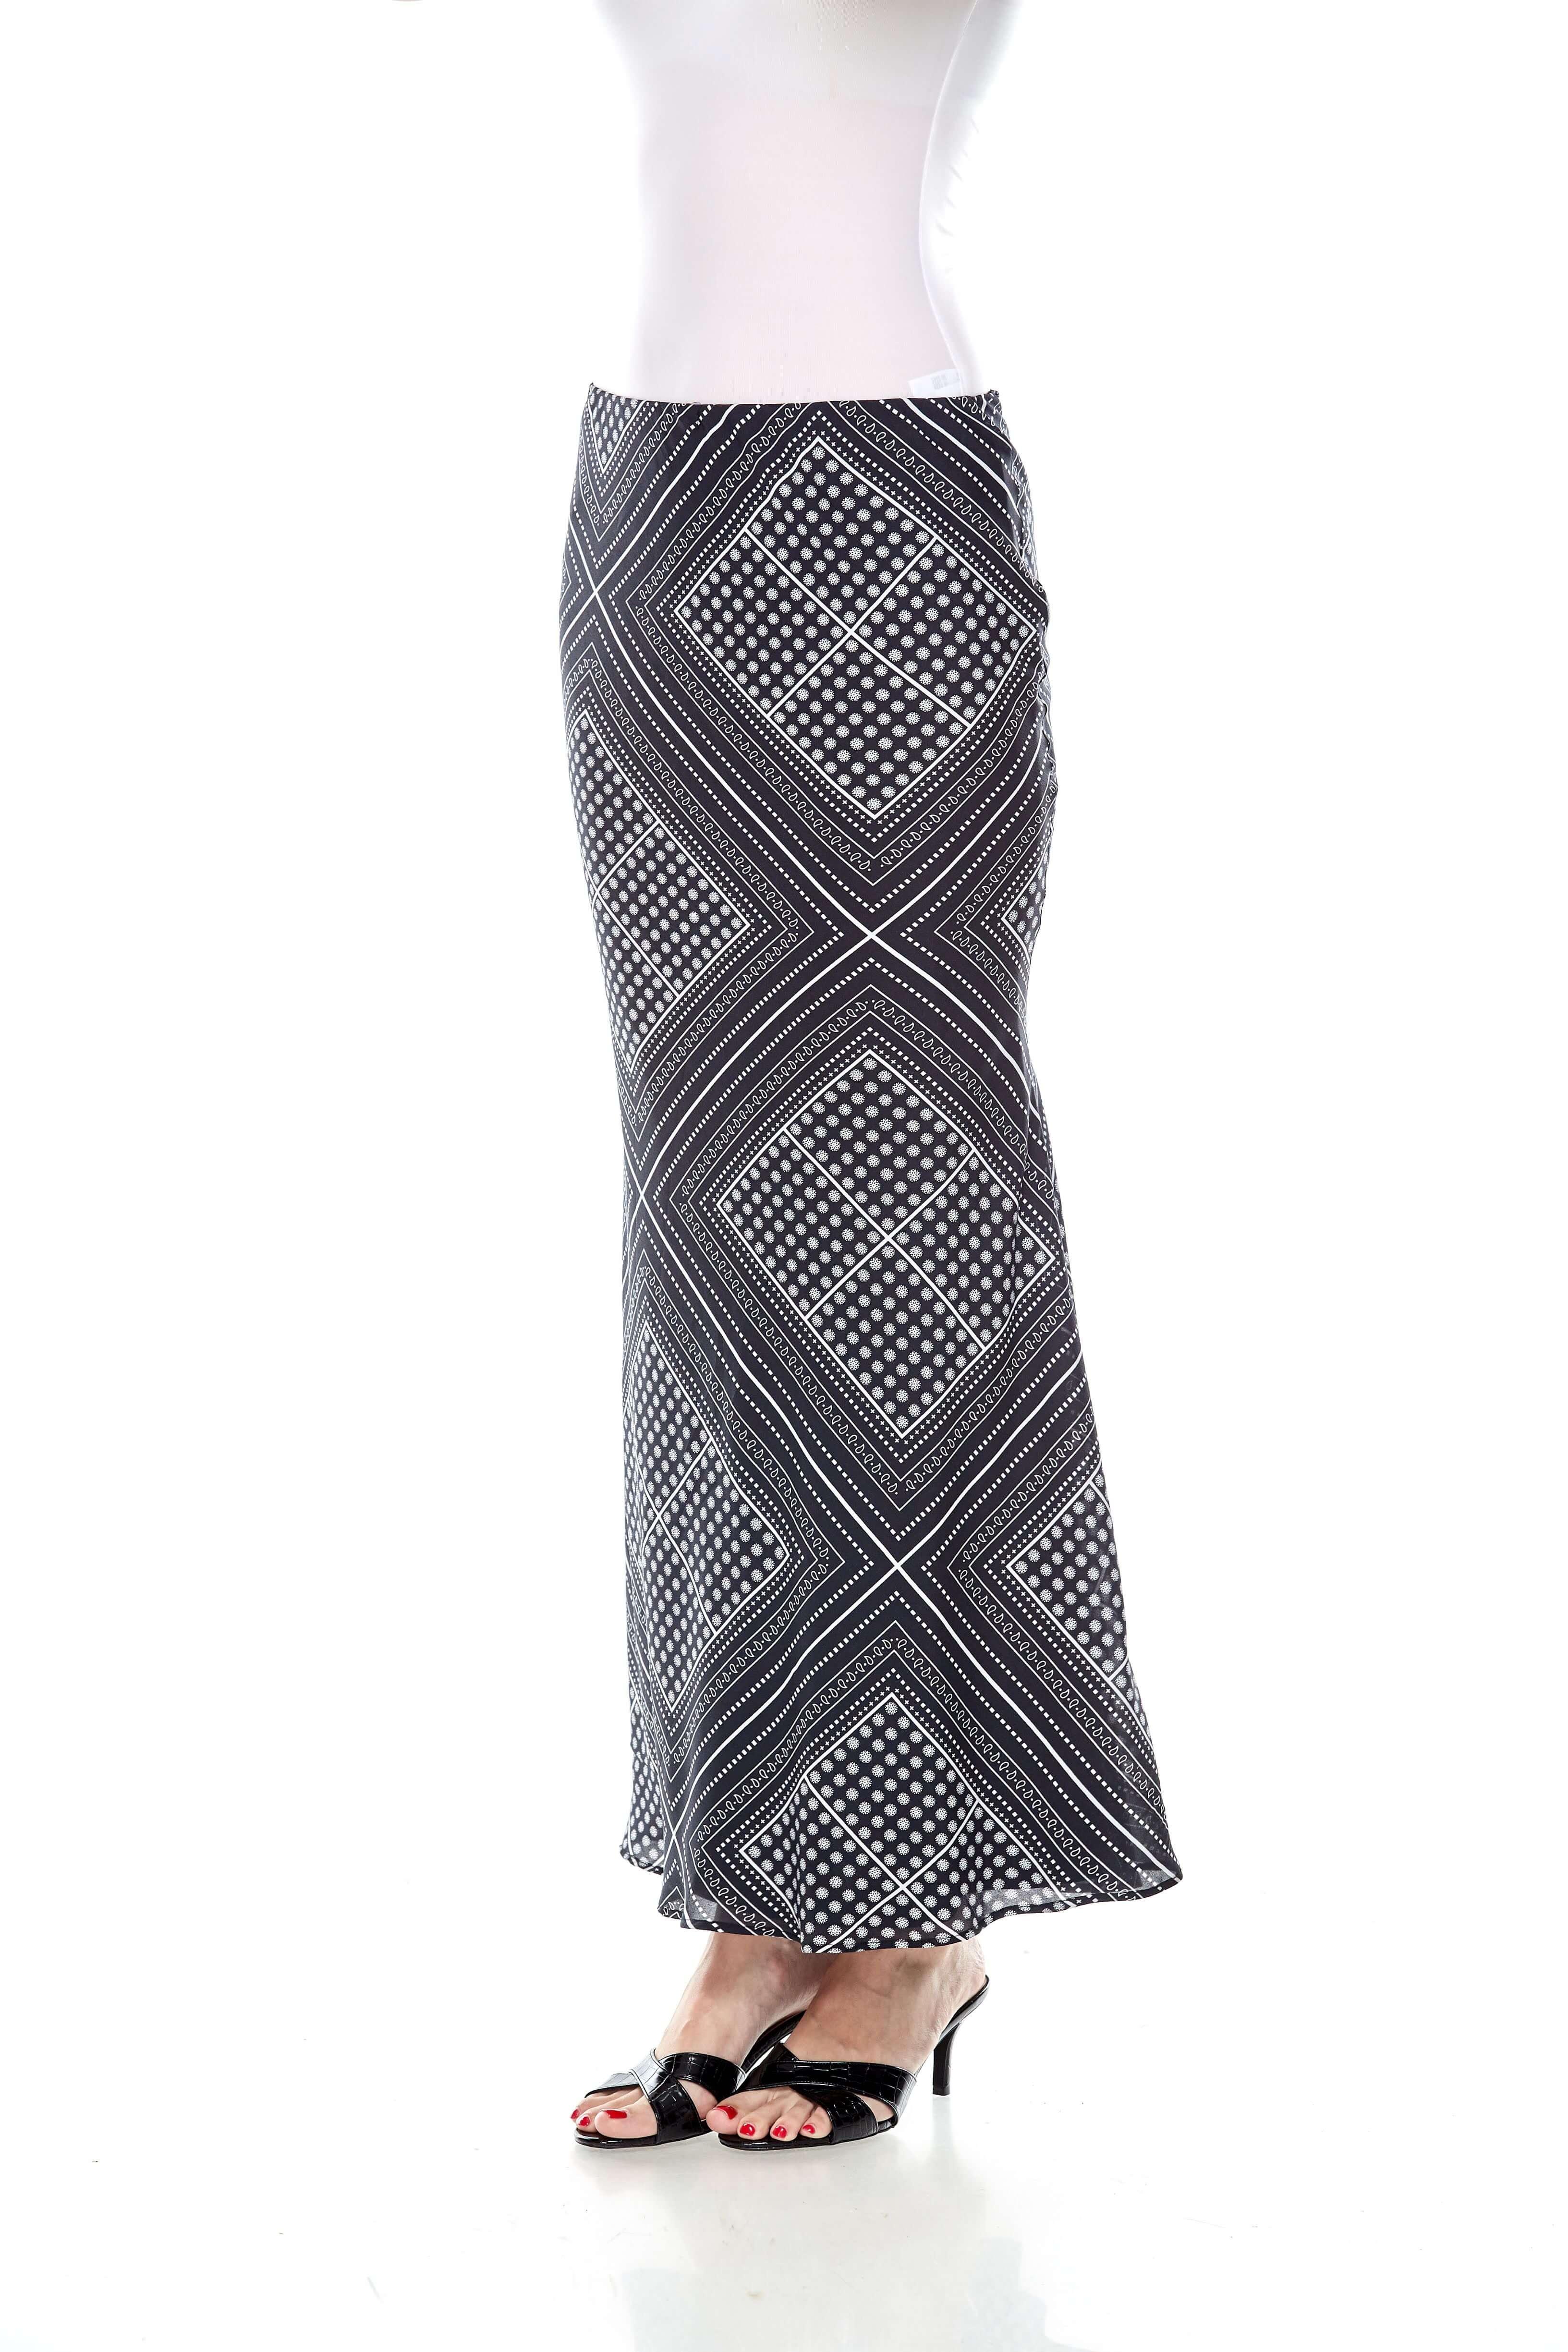 Black Handkerchief Print Mermaid Skirt (3)